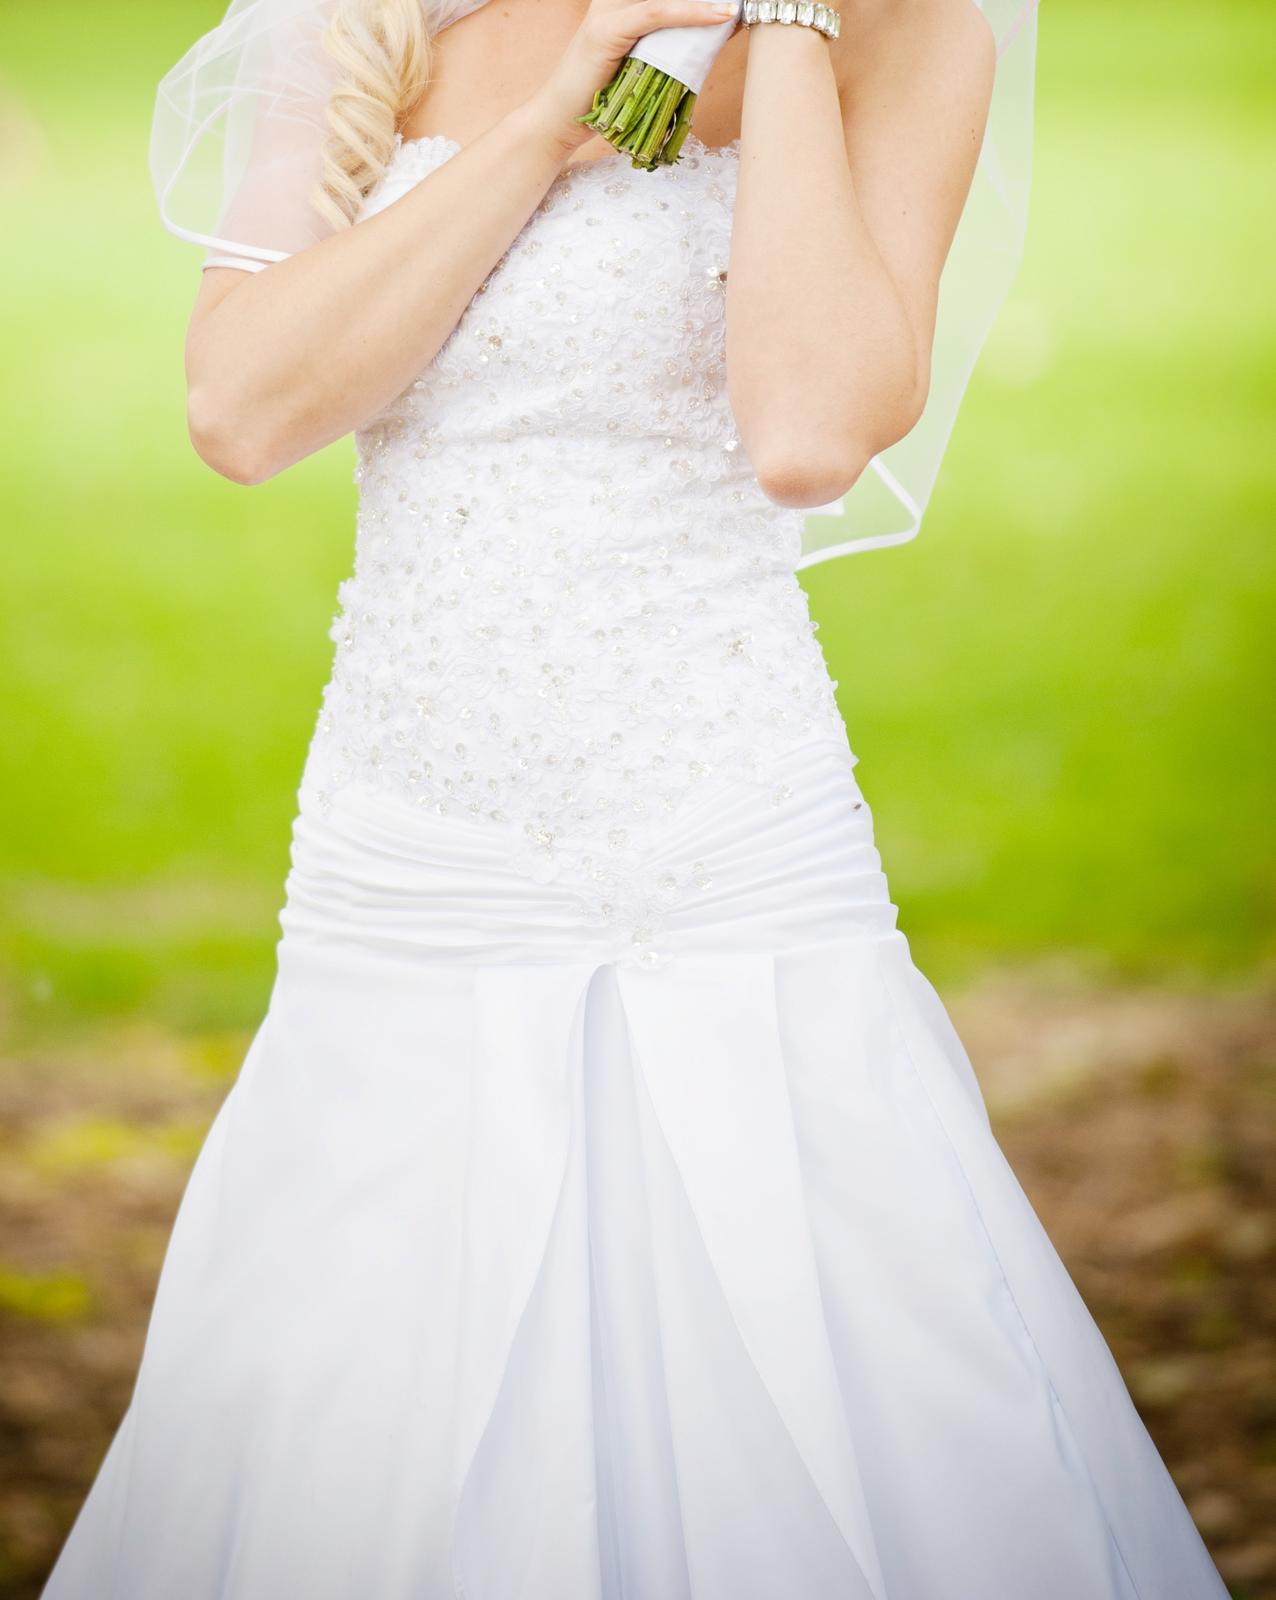 jedinečné svadobné šaty - Obrázok č. 3